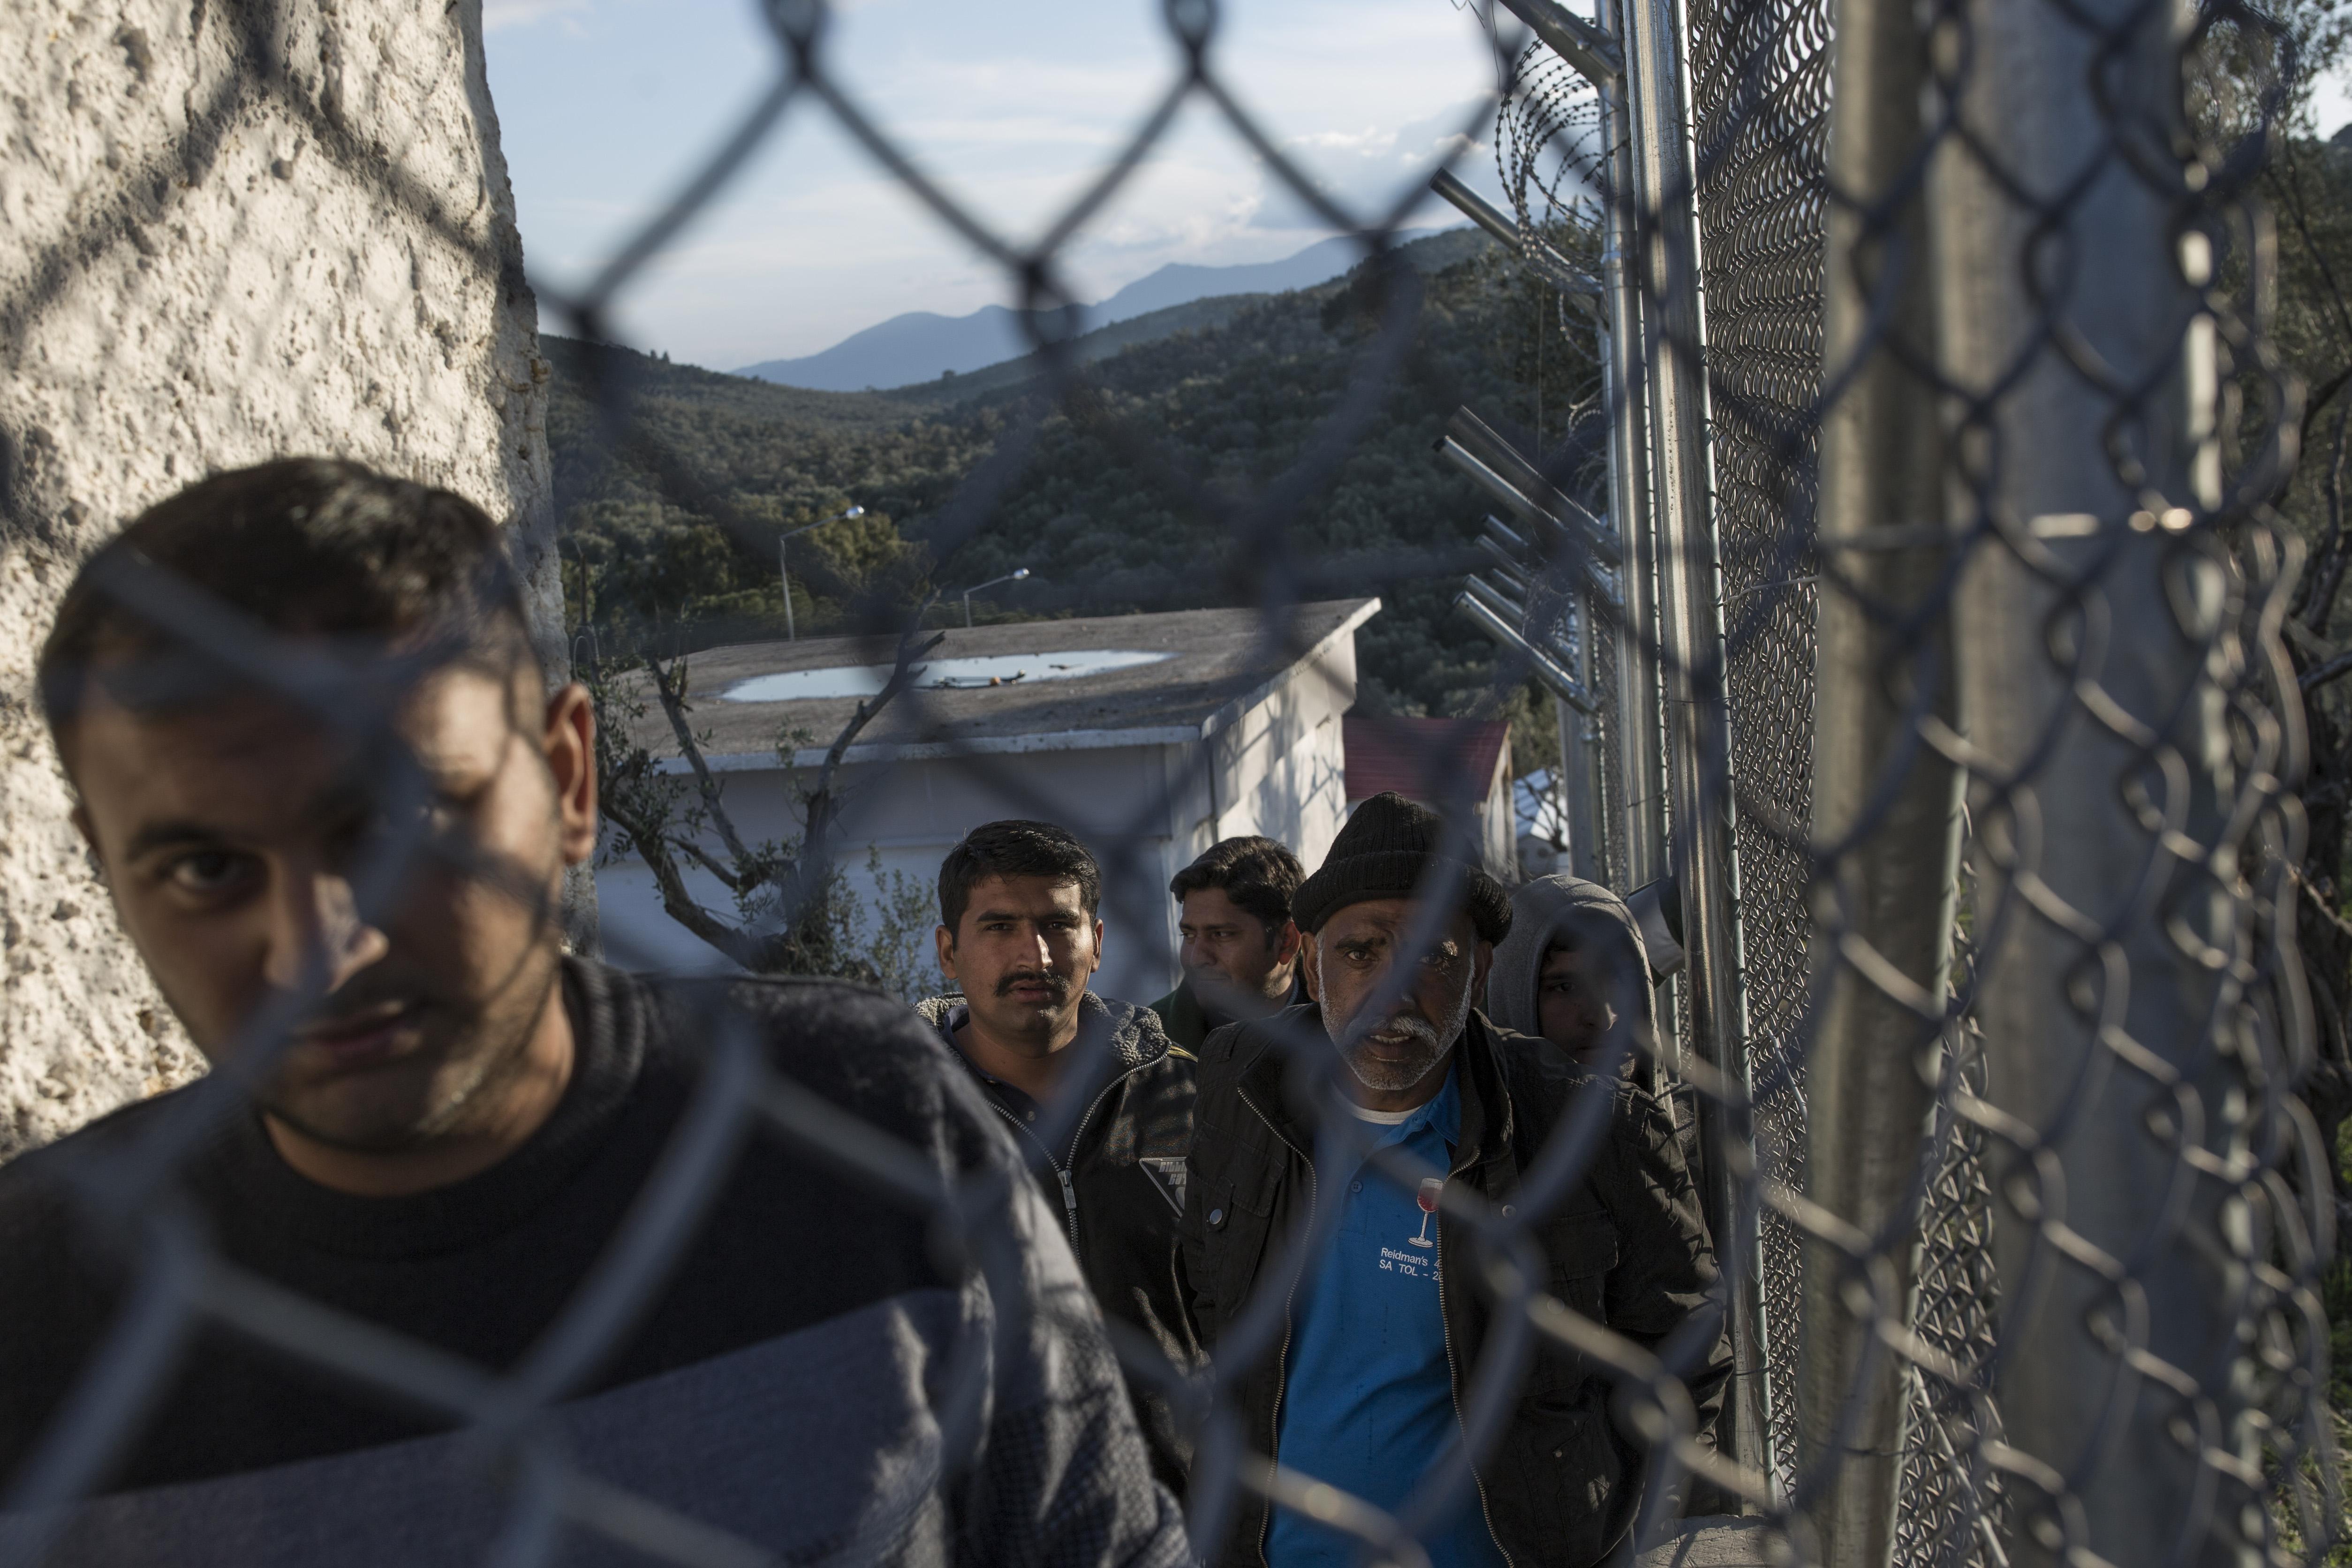 Griechenland plant große Flüchtlingslager: Platzen des Türkei-Deals befürchtet